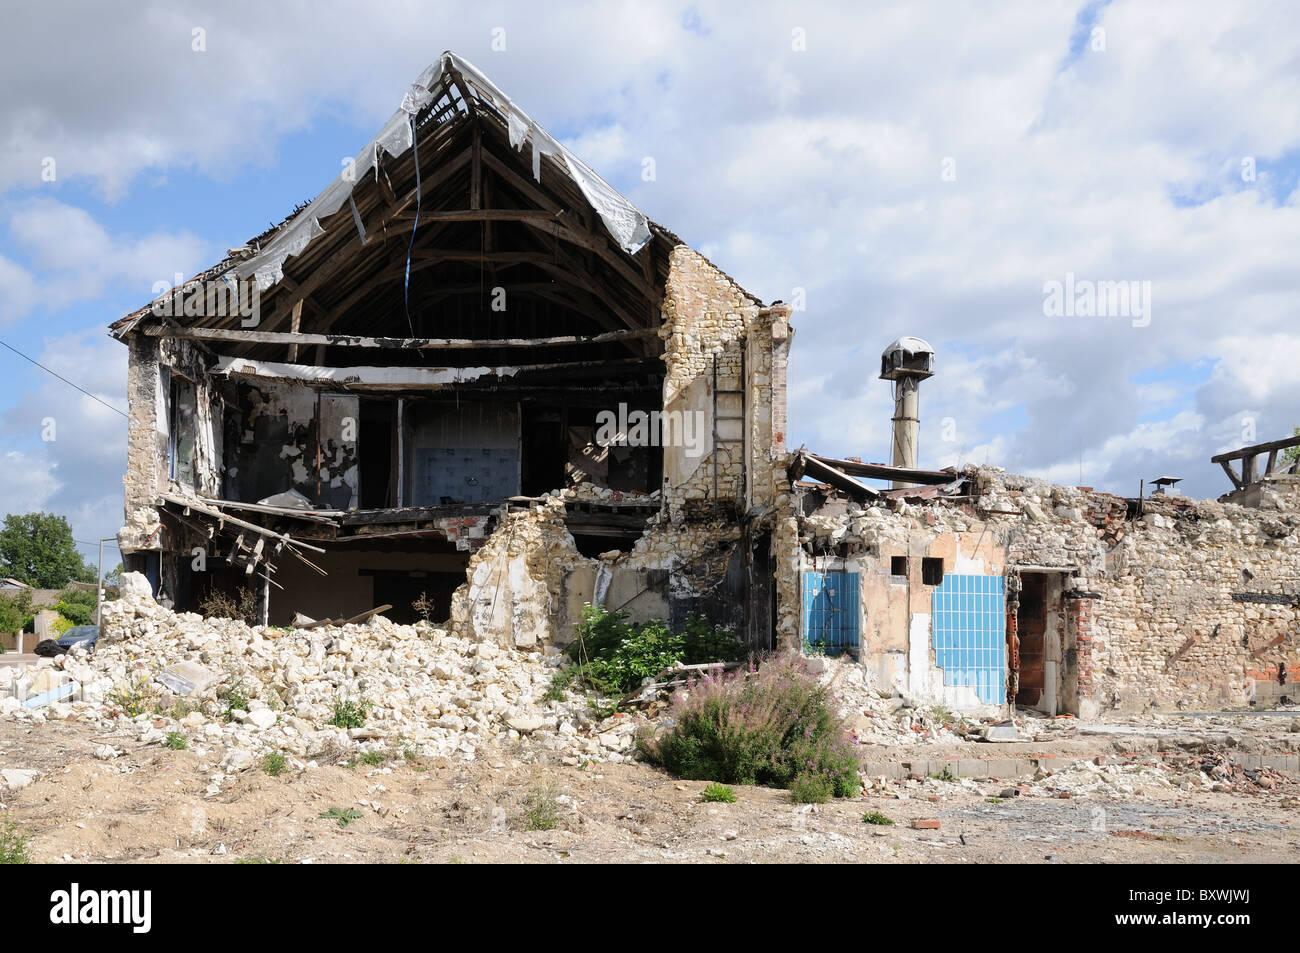 Partially demolished house building near Joigny Burgundy France - Stock Image